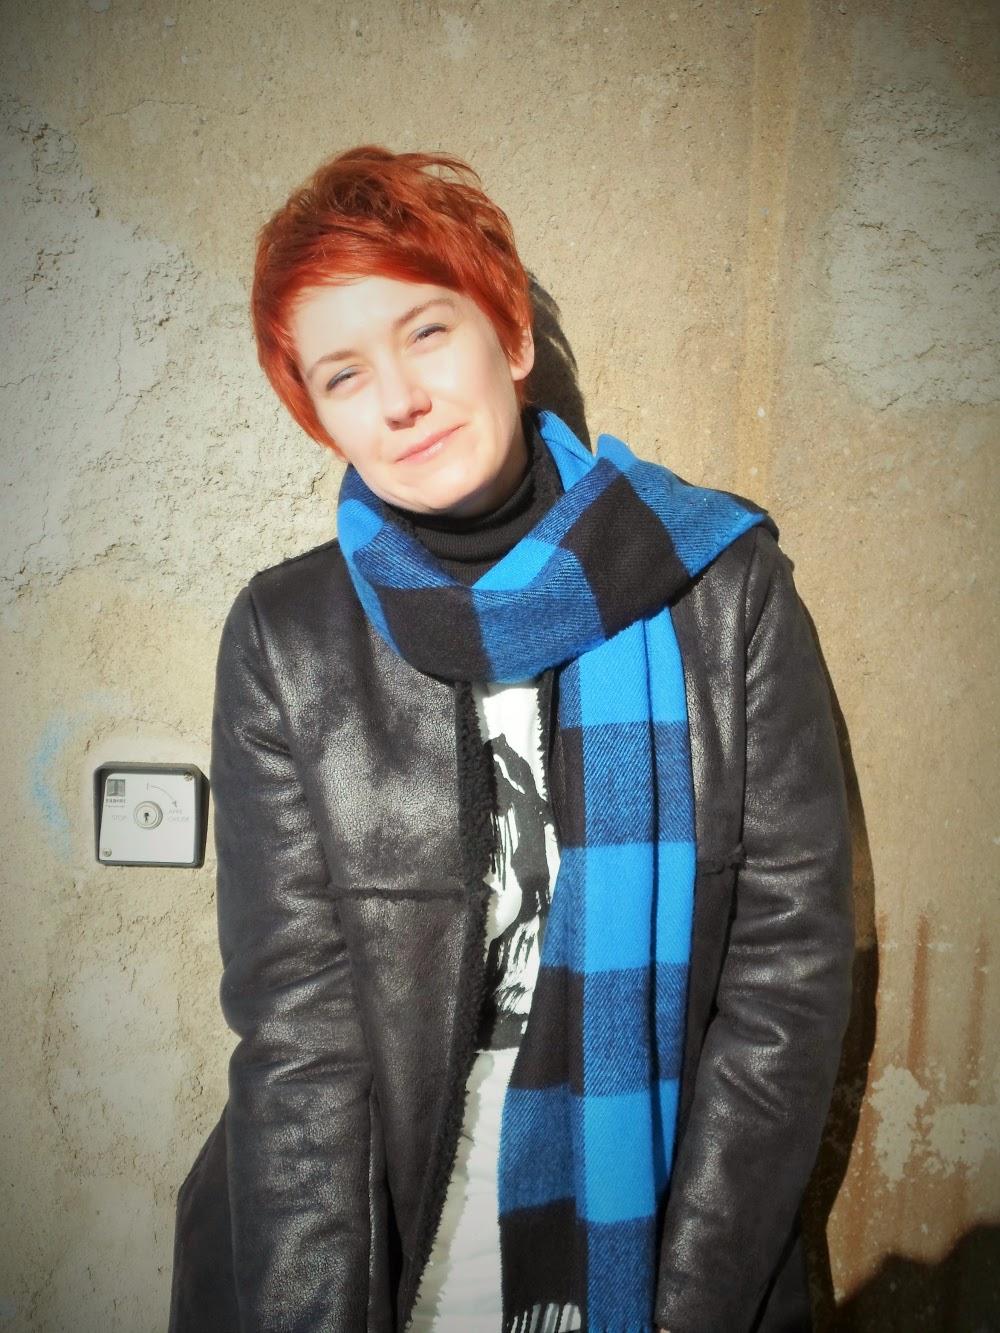 graffiti sweater plaid scarf fashion style blog